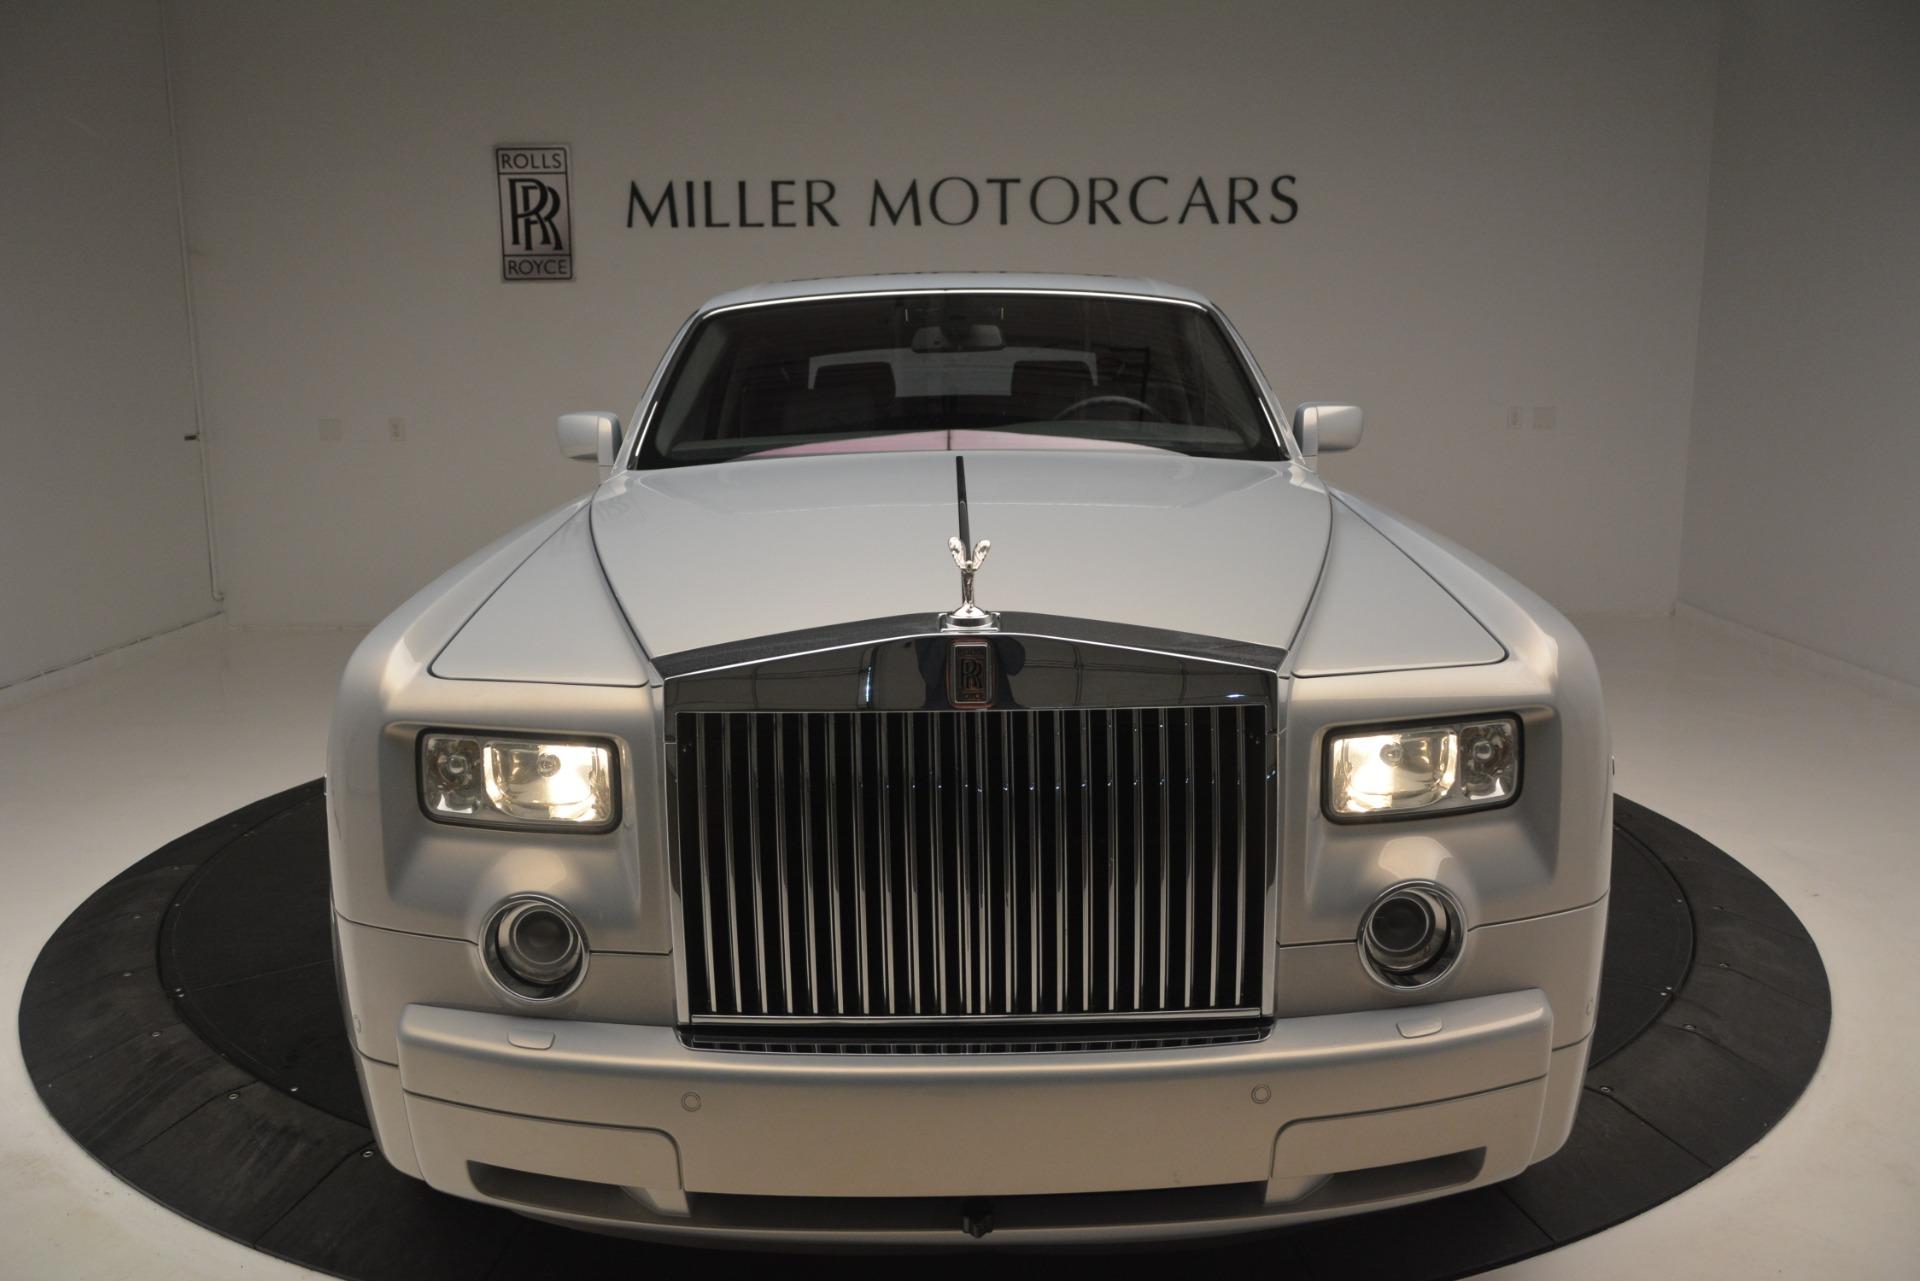 Used 2007 Rolls-Royce Phantom  For Sale In Greenwich, CT 3089_p6